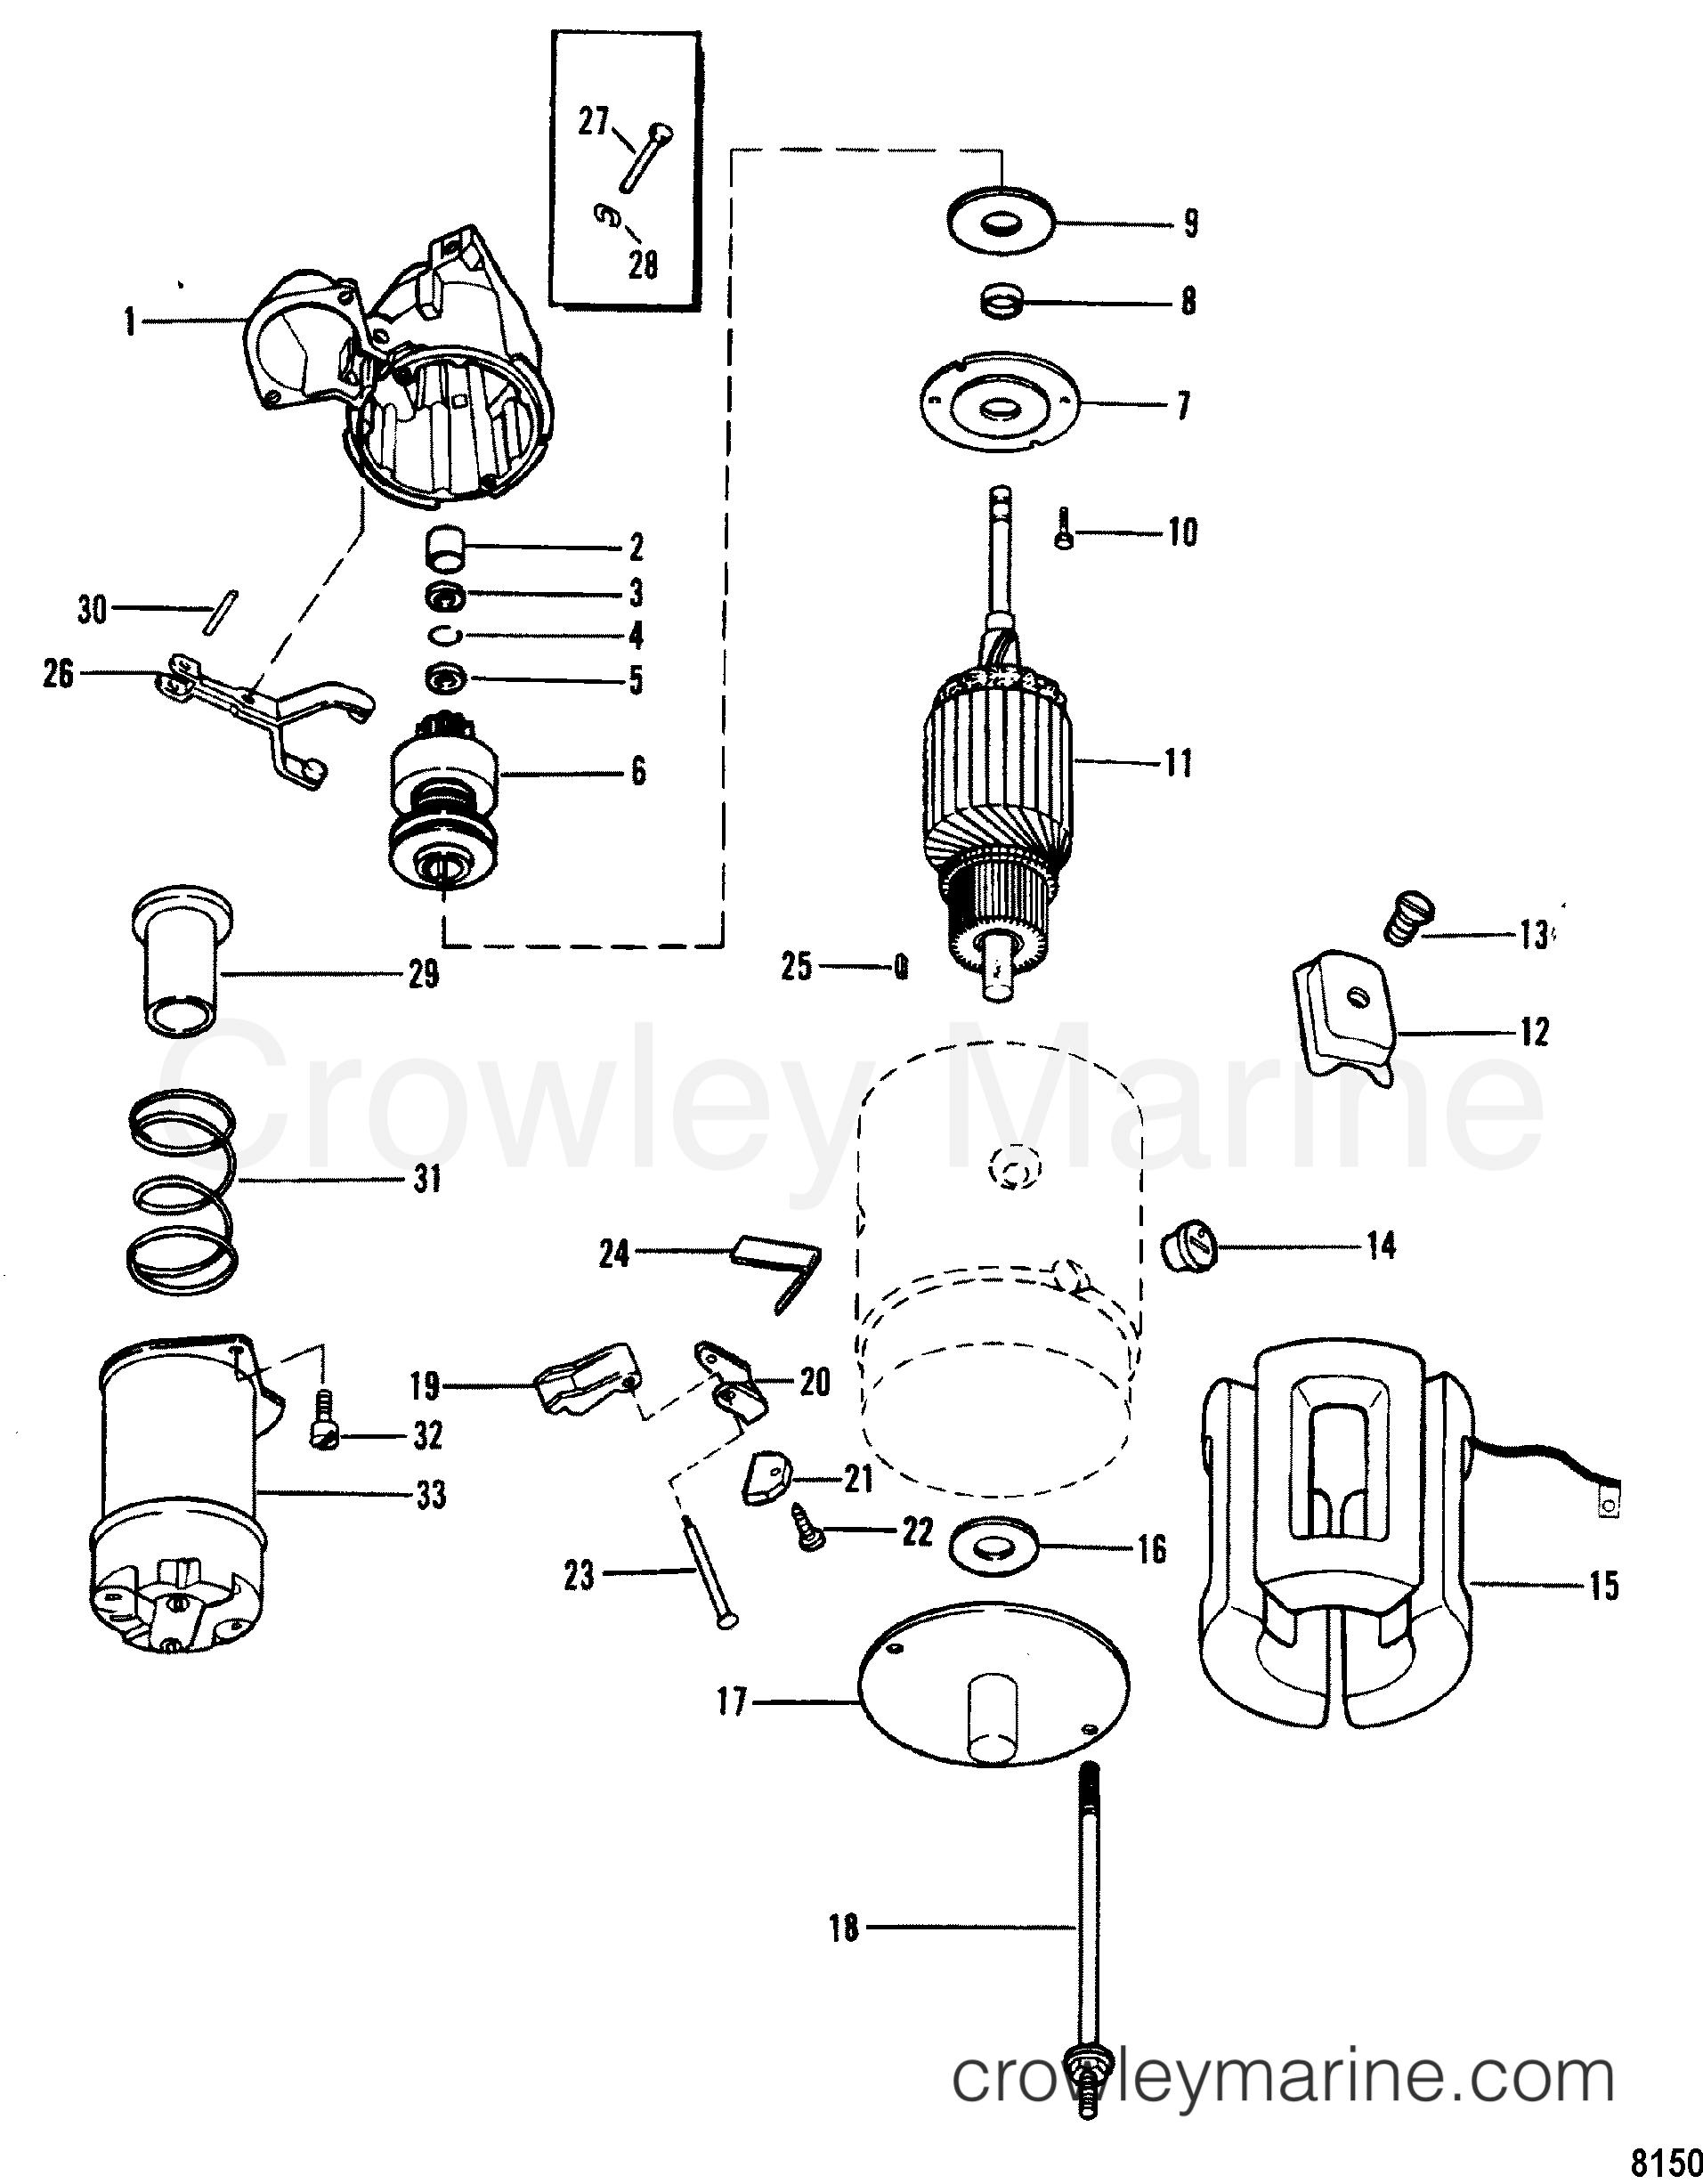 Starter motordelco remy 1998317 1990 mercruiser 30l alpha i 1990 mercruiser 30l alpha i 430b00001 starter motordelco remy swarovskicordoba Images